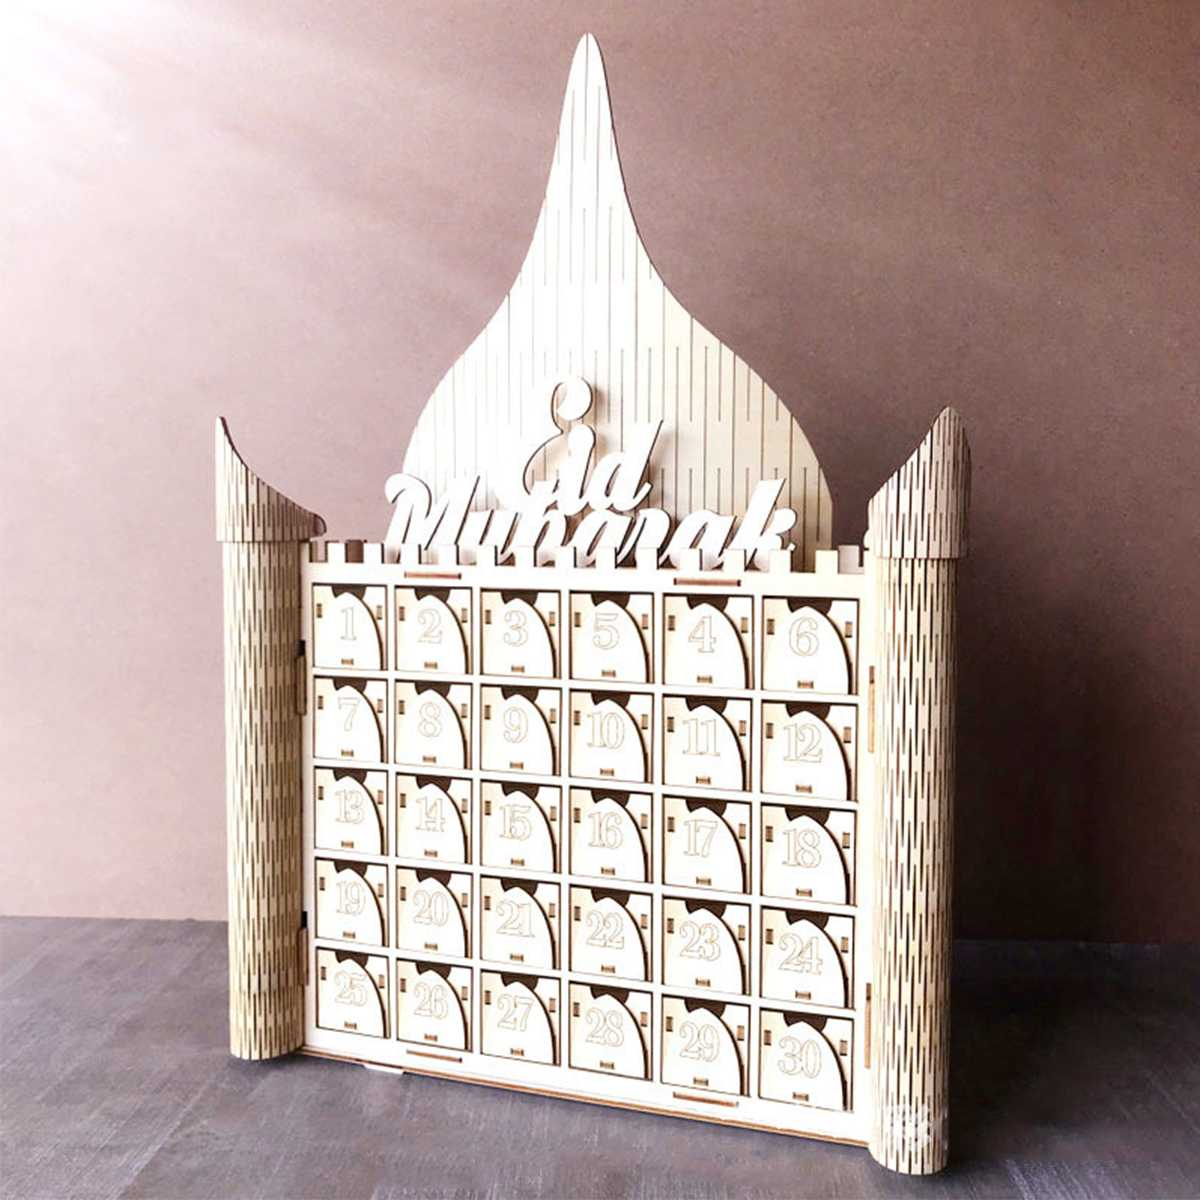 Wooden MDF Eid Mubarak Ramadan Advent Calendar 30 Day Countdown Muslim Islamic Countdown House Drawer Decorations Ornament Gift